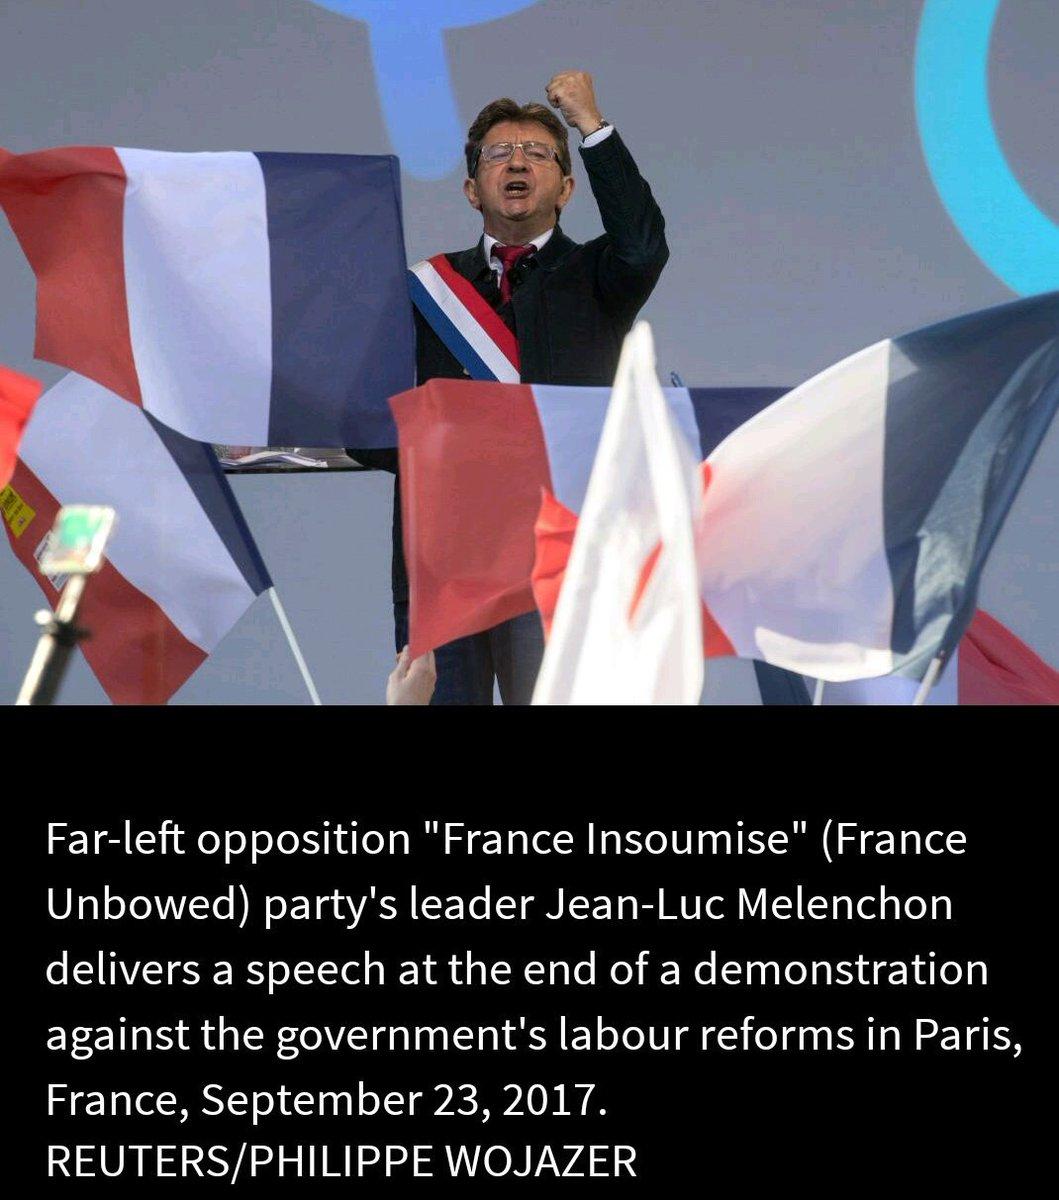 &quot;France&#39;s far-left leader urges French &#39;resistance&#39; against #Macron&quot;   http://www. reuters.com/article/us-fra nce-reform-protests/frances-far-left-leader-urges-french-resistance-against-macron-idUSKCN1BY07K &nbsp; … <br>http://pic.twitter.com/z5okDd1jnH